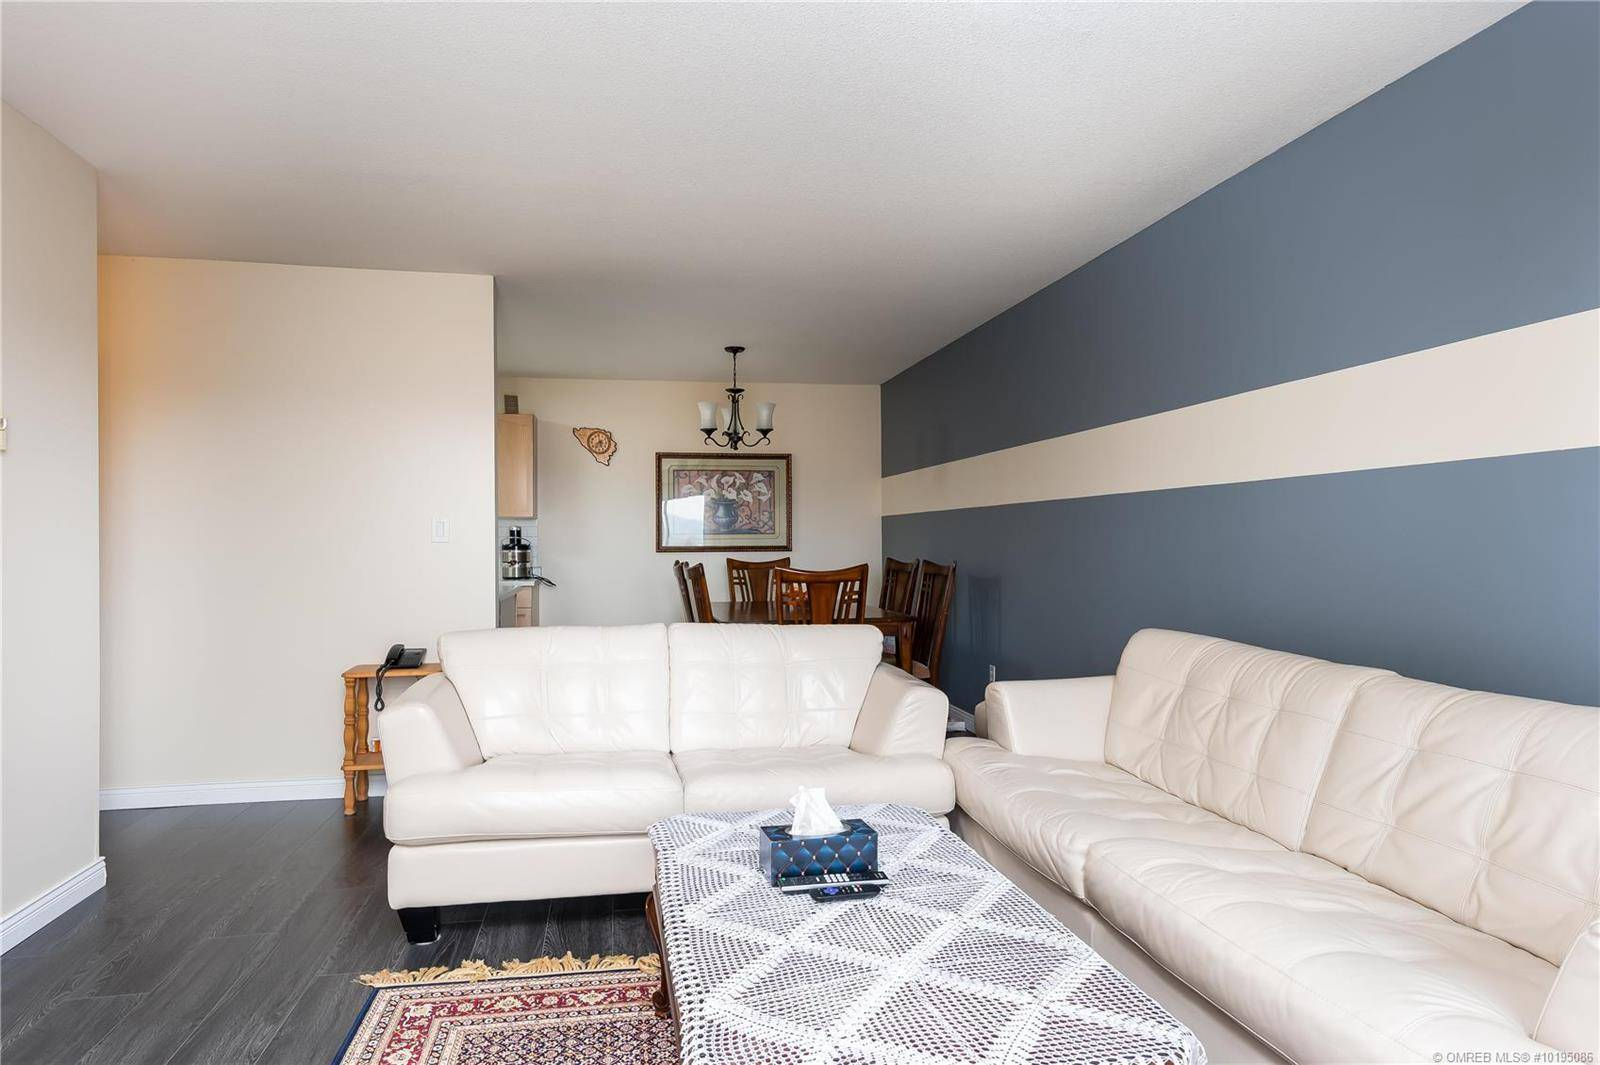 Condo for sale at 769 Klo Rd Unit 406 Kelowna British Columbia - MLS: 10195086